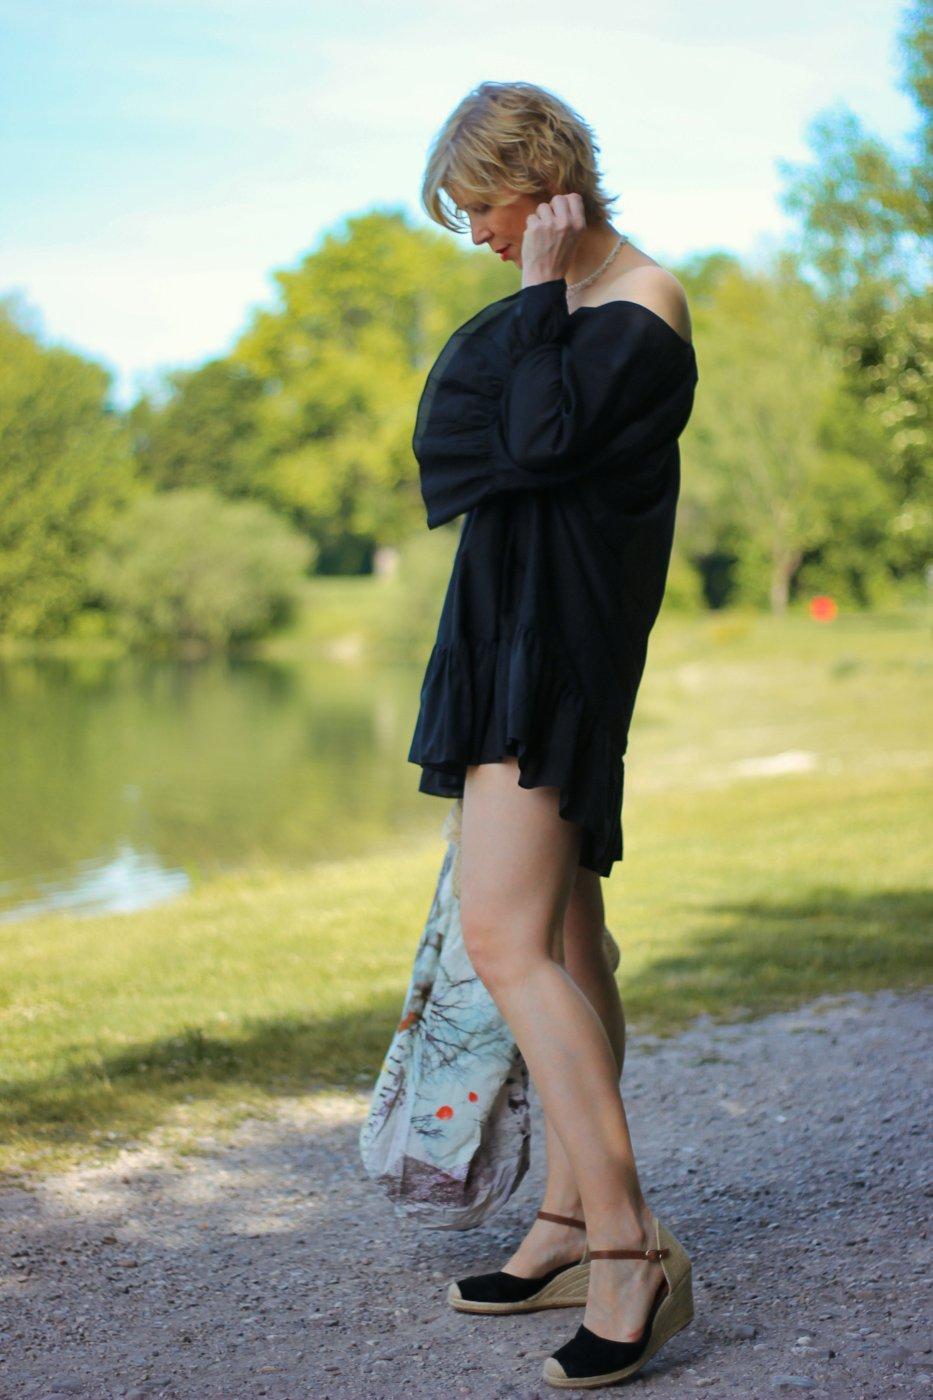 conny doll lifestyle: Beachbabe, Urlaub, Coronazeiten, Strandtunika